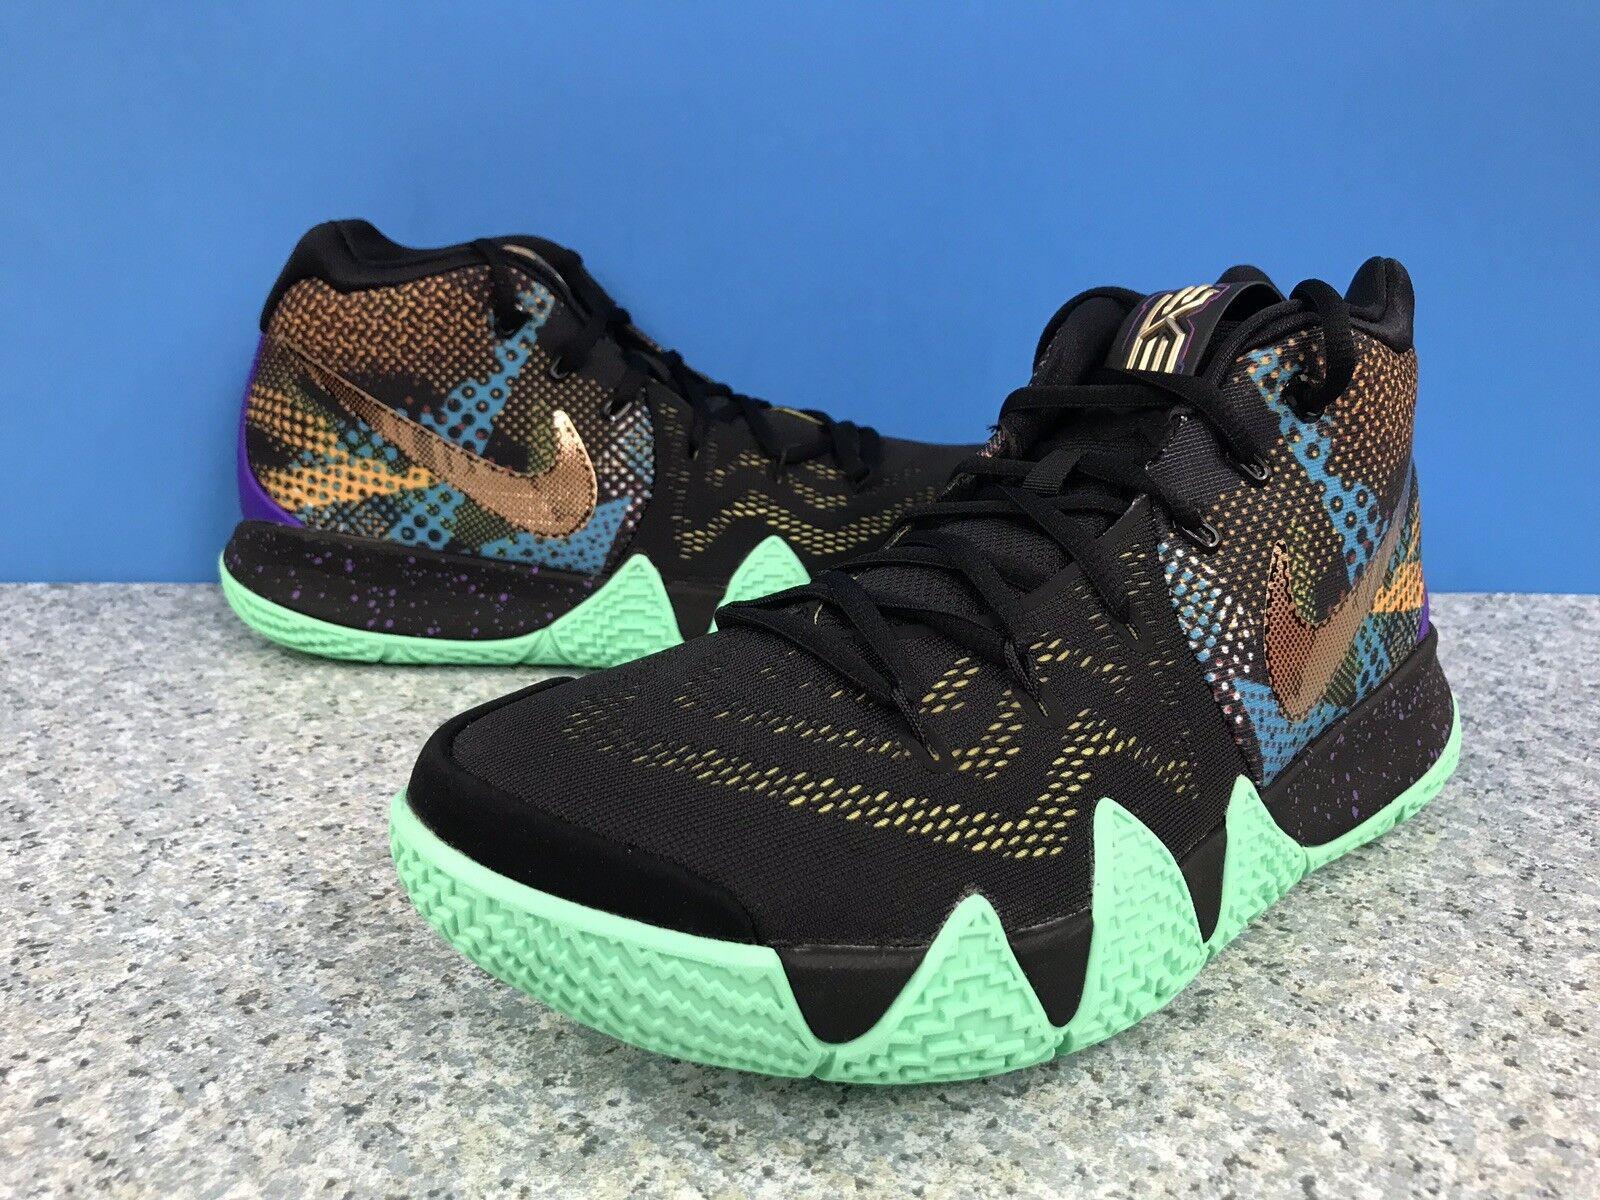 Nike Kyrie 4 Mamba Mentality AV2597-001 Black Sonic Yellow Basketball Sz 10.5